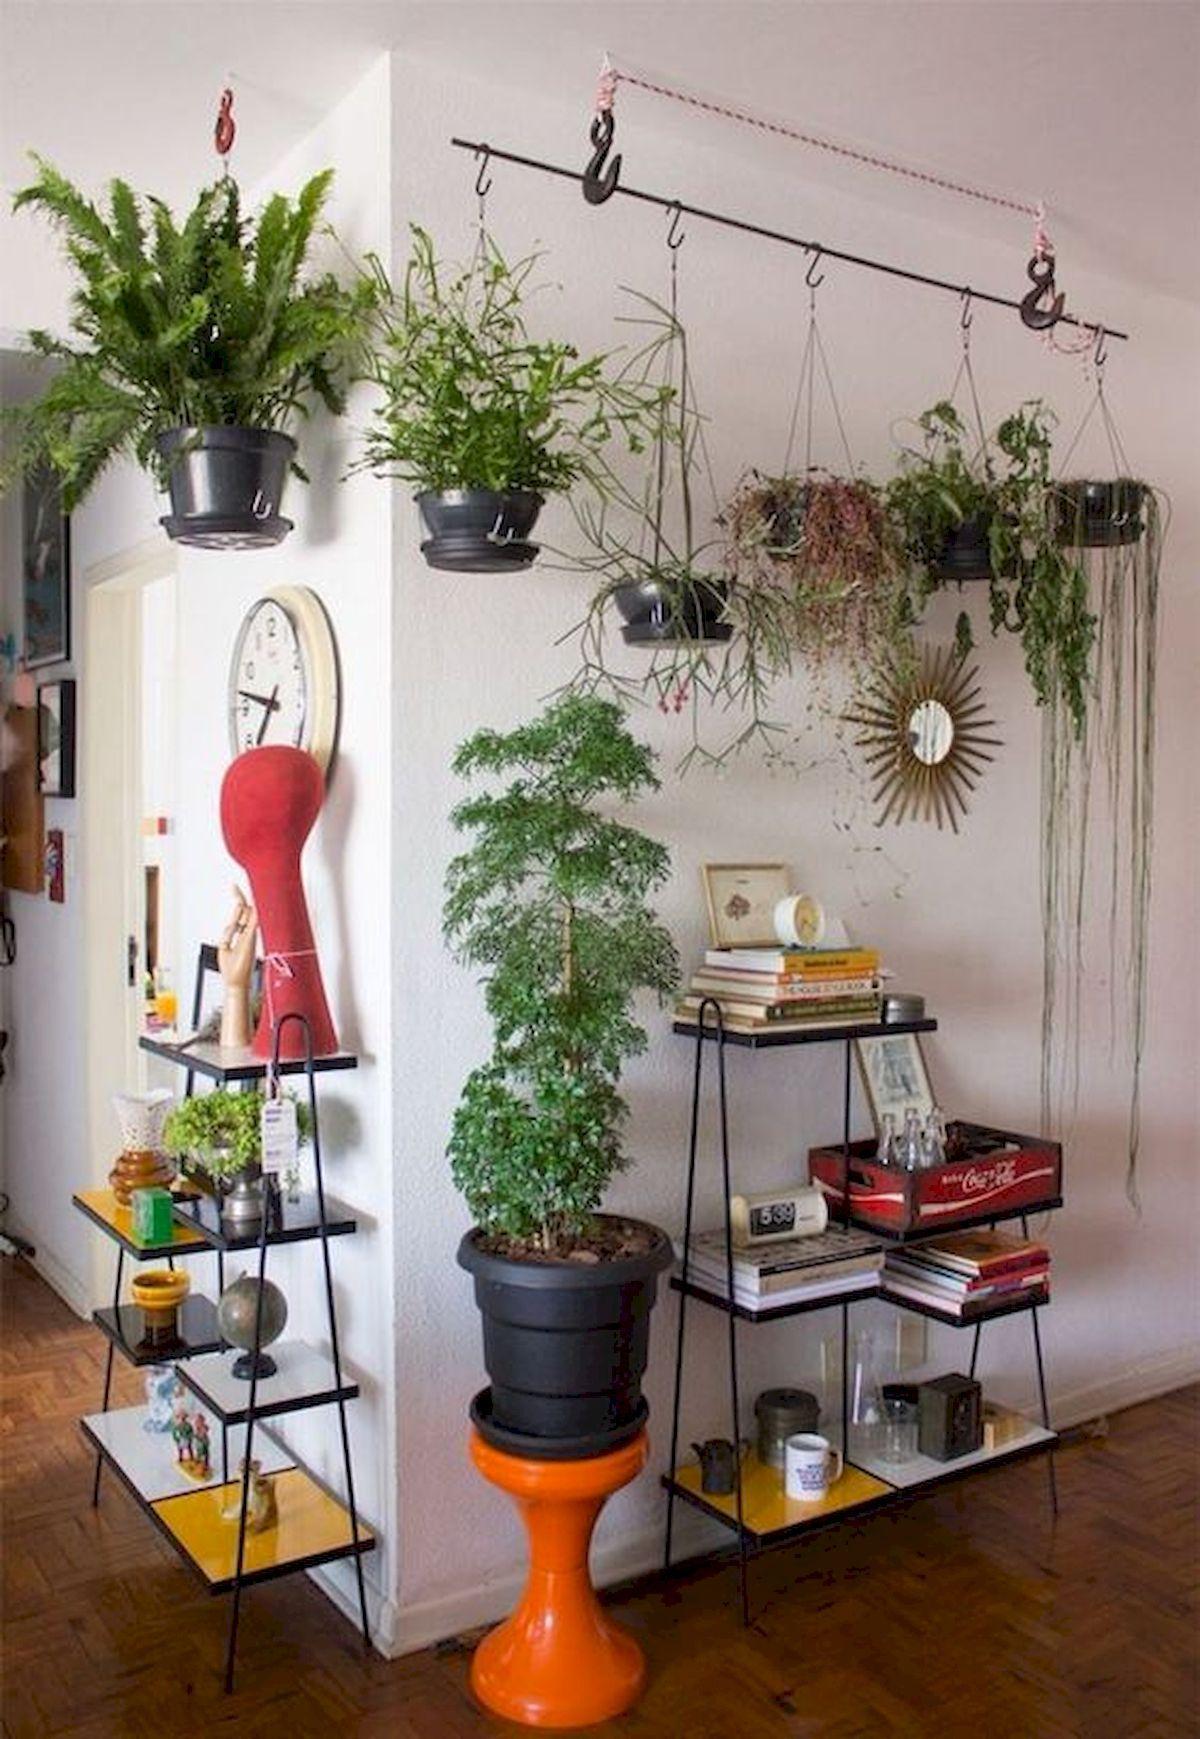 Cool 50 Best Indoor Garden For Apartment Design Ideas And Remodel Https Coachdecor Com 50 Best Indoor Garden For Apartment Cheap Home Decor Decor Home Decor